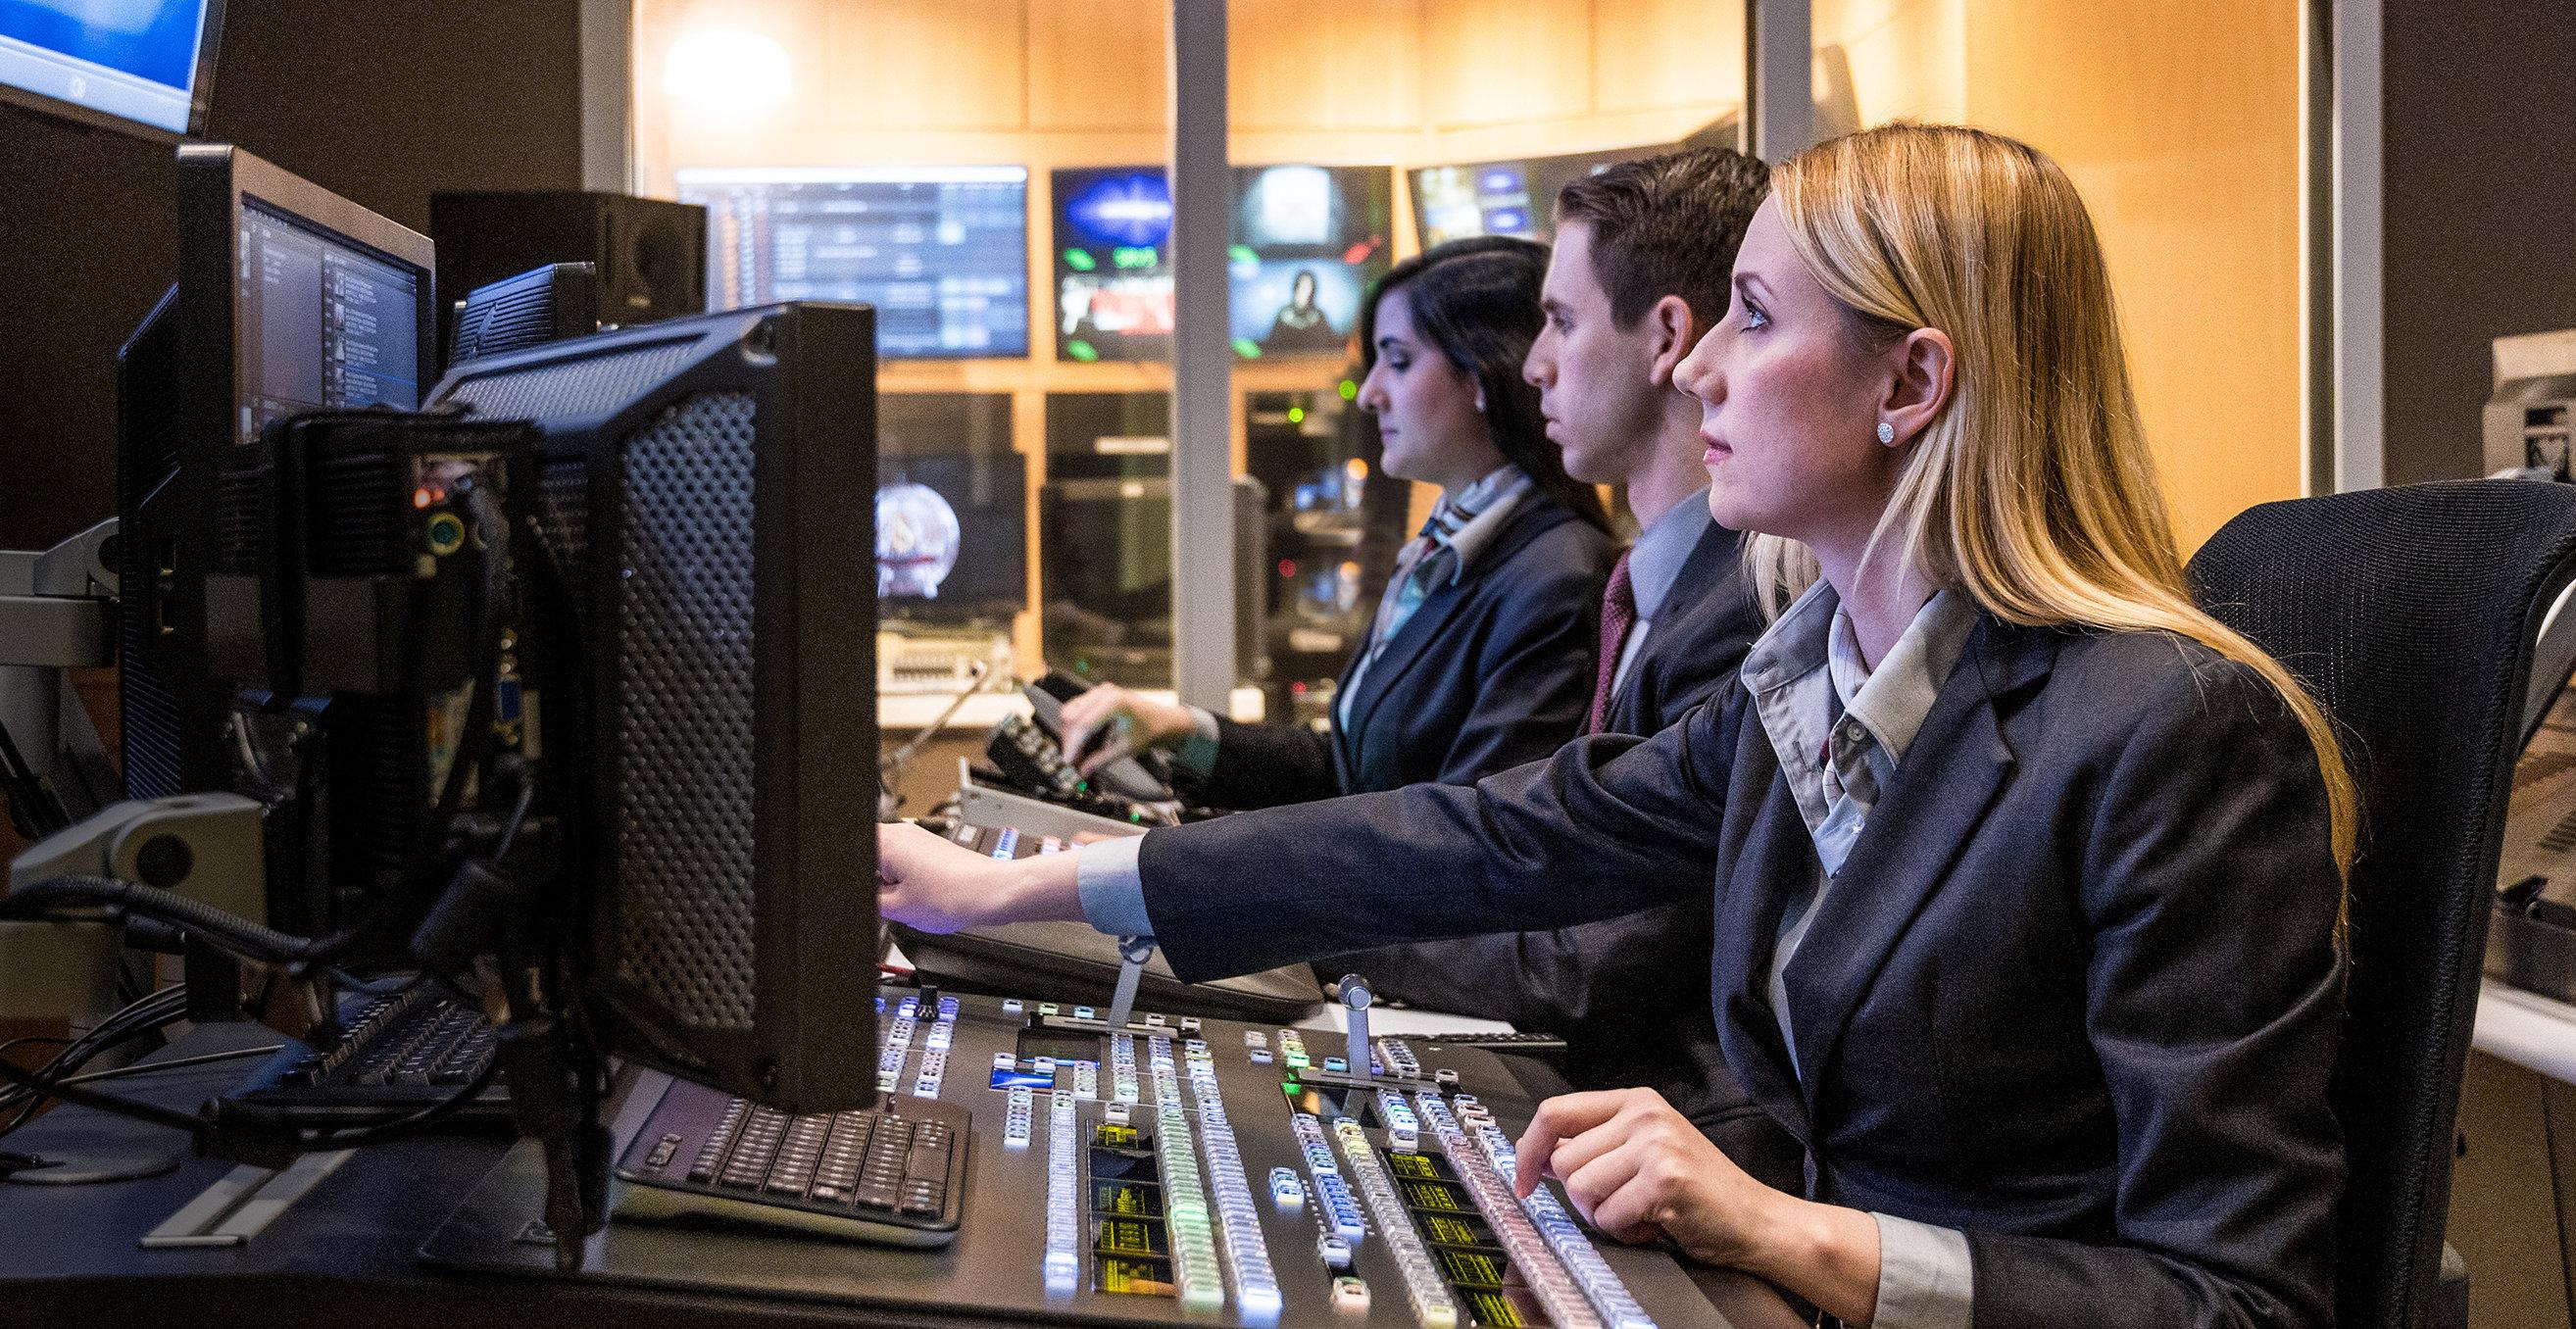 Scientology Media Productions TV control rooms